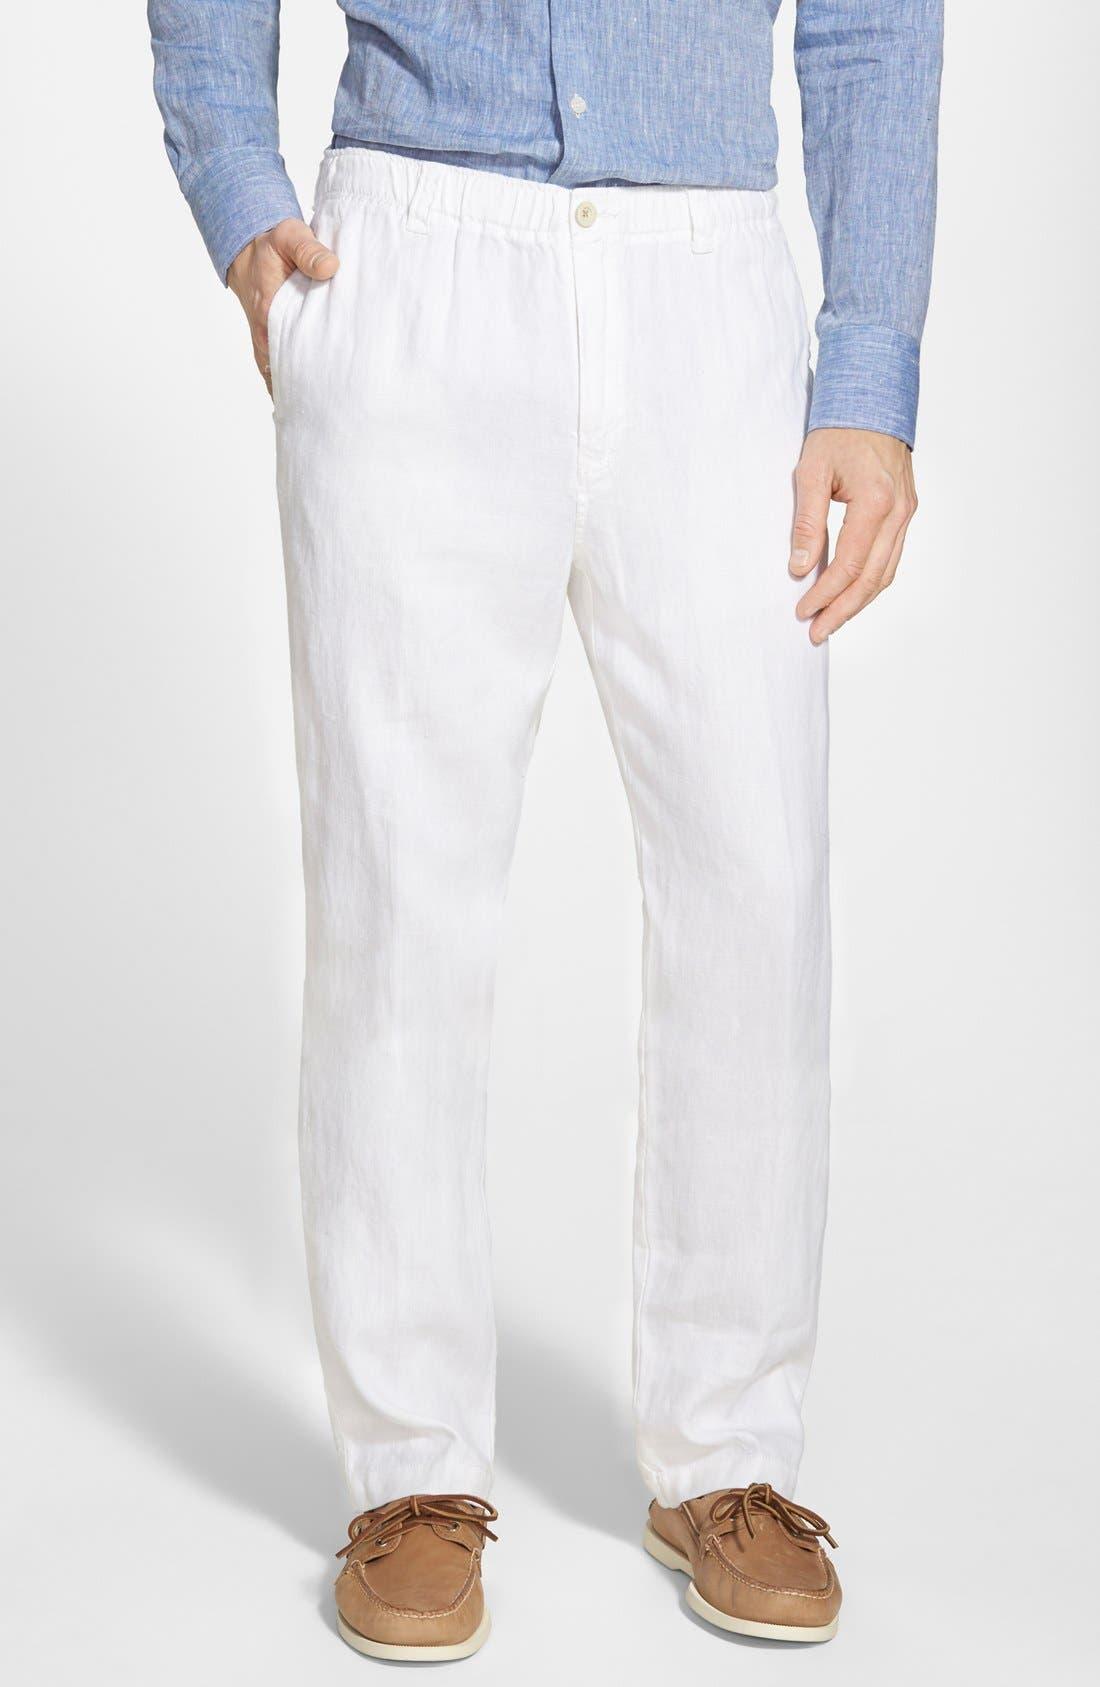 New Linen on the Beach Linen Pants,                         Main,                         color, White